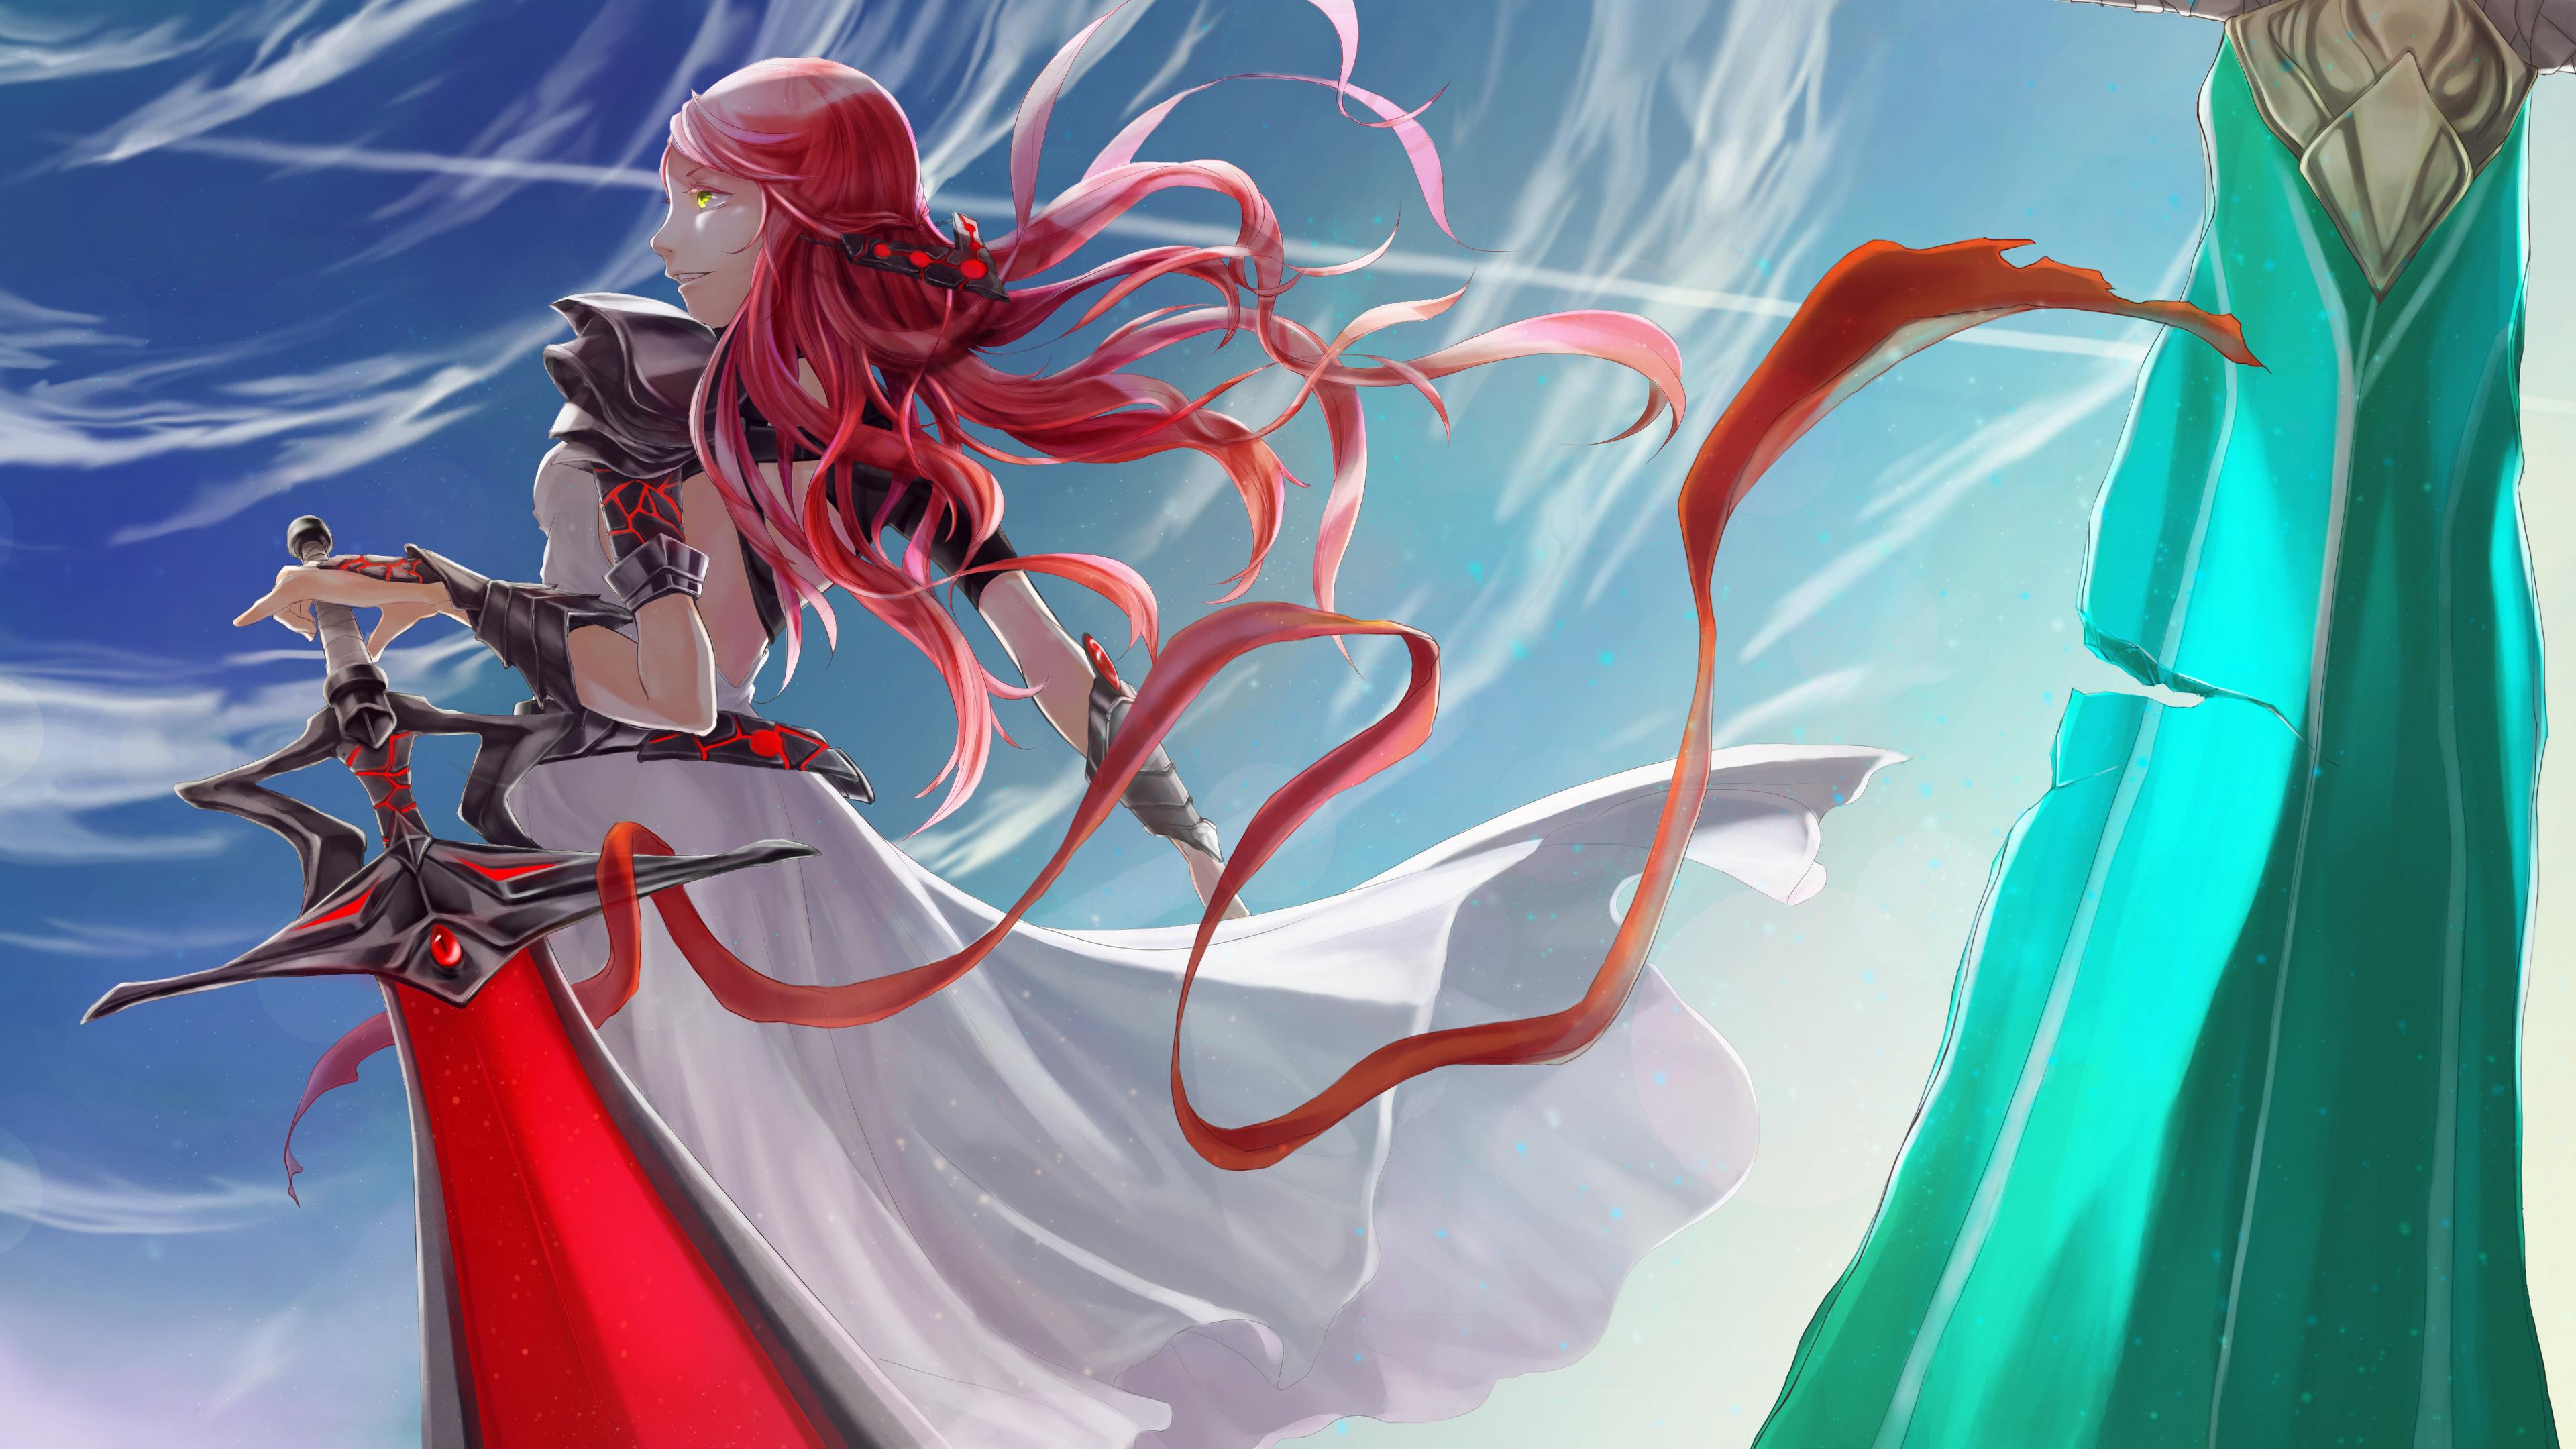 IPhone 6 Plus Anime Wallpaper